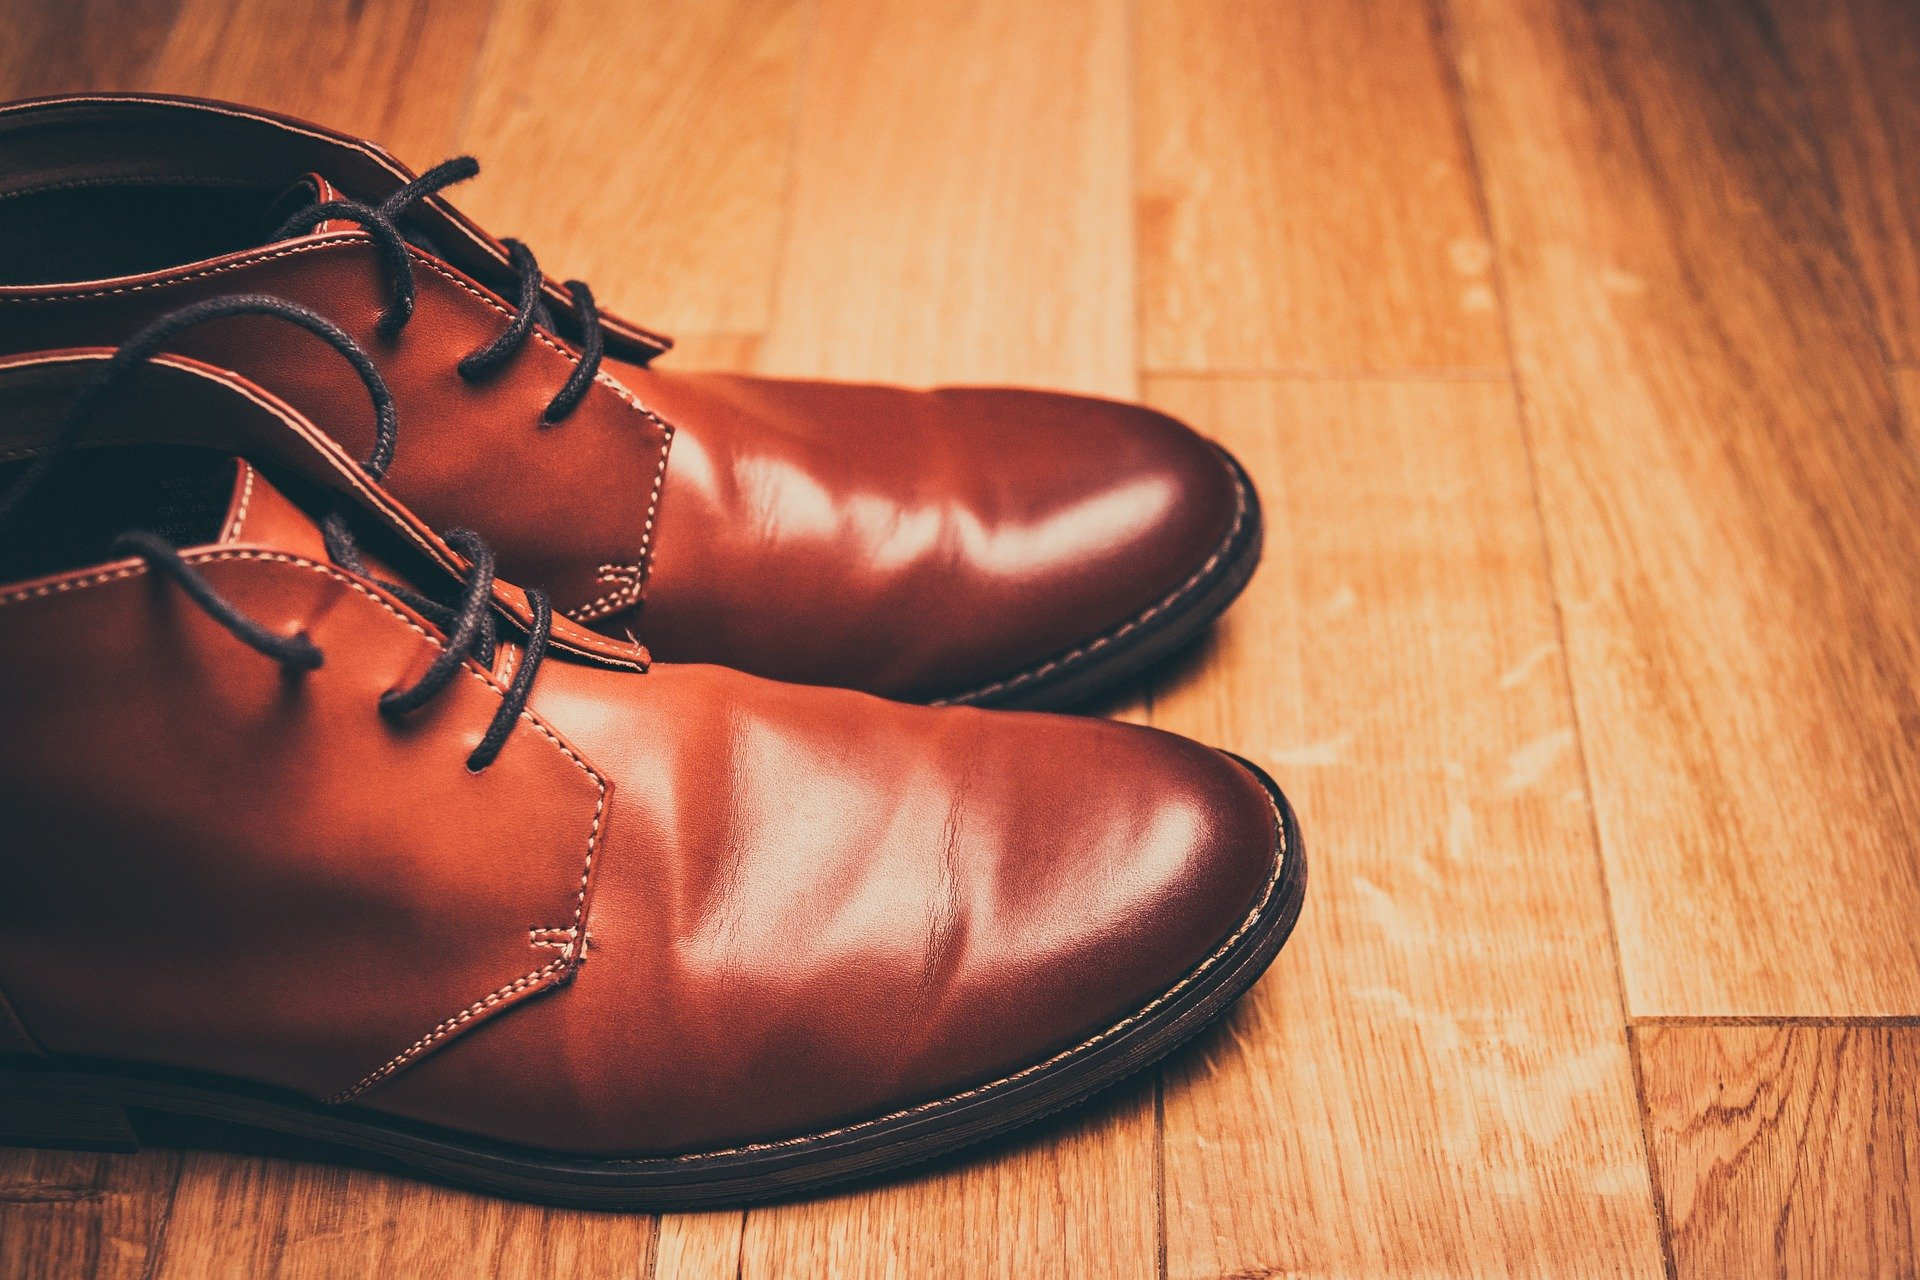 Chaussures - Cordonnerie